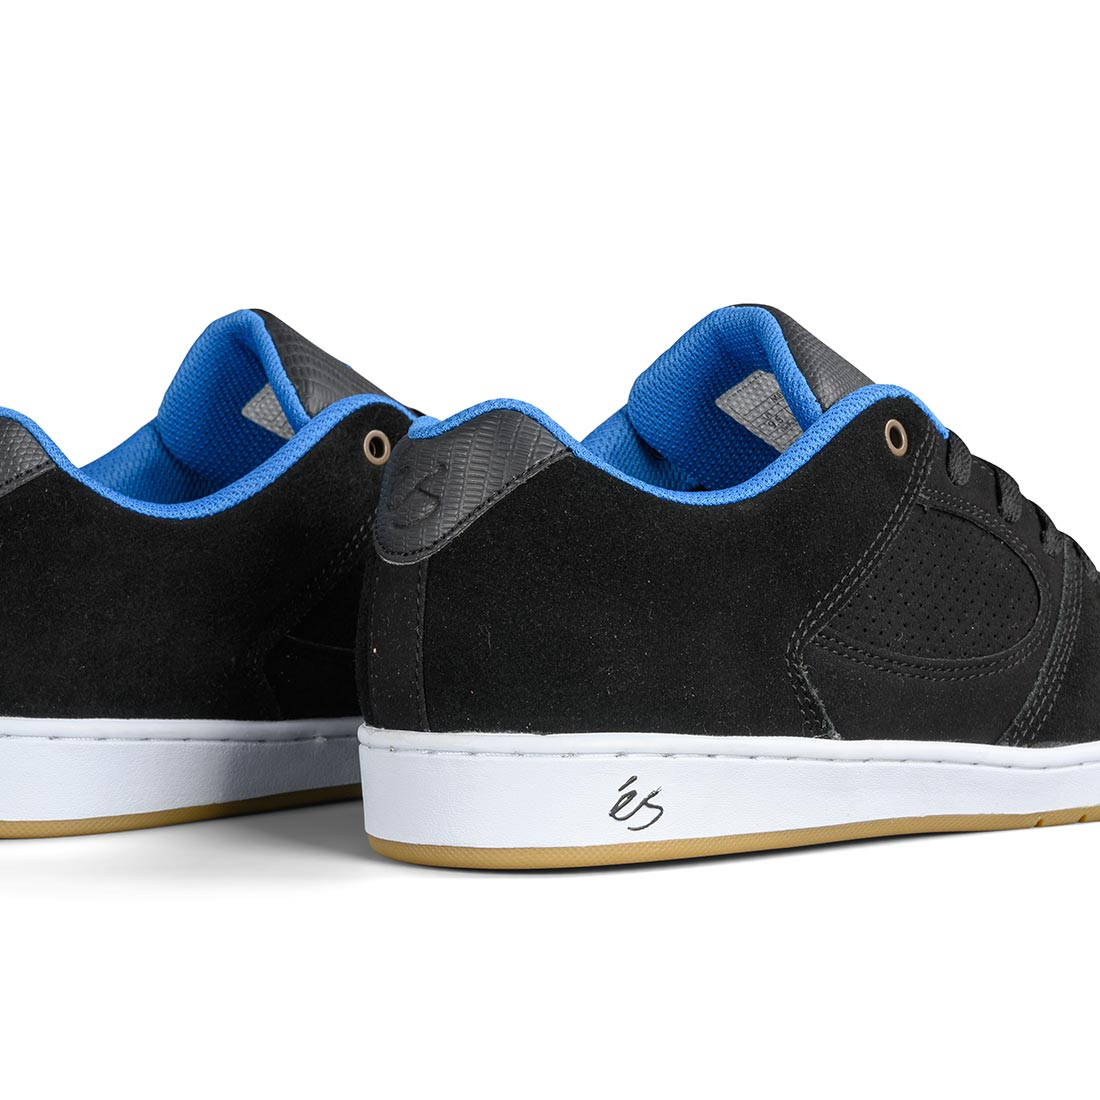 eS Accel Slim Shoes - Black / White